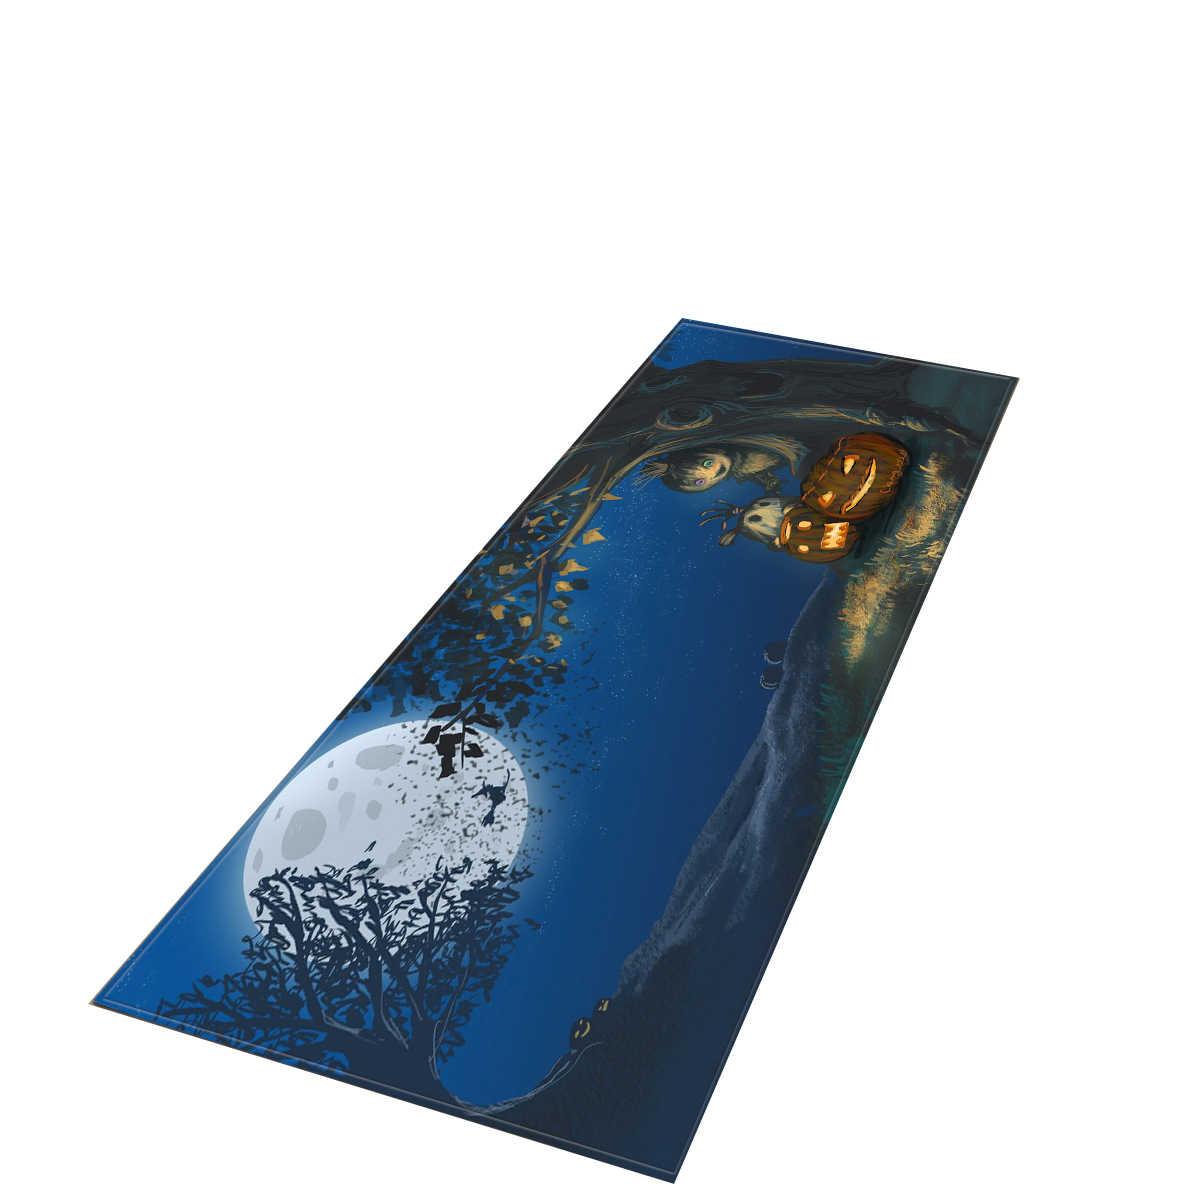 Zeegle ハロウィンカーペットロング長方形キッチンラグカーペットのリビングルームのカーペット廊下床敷物洗えるカーペット寝室用